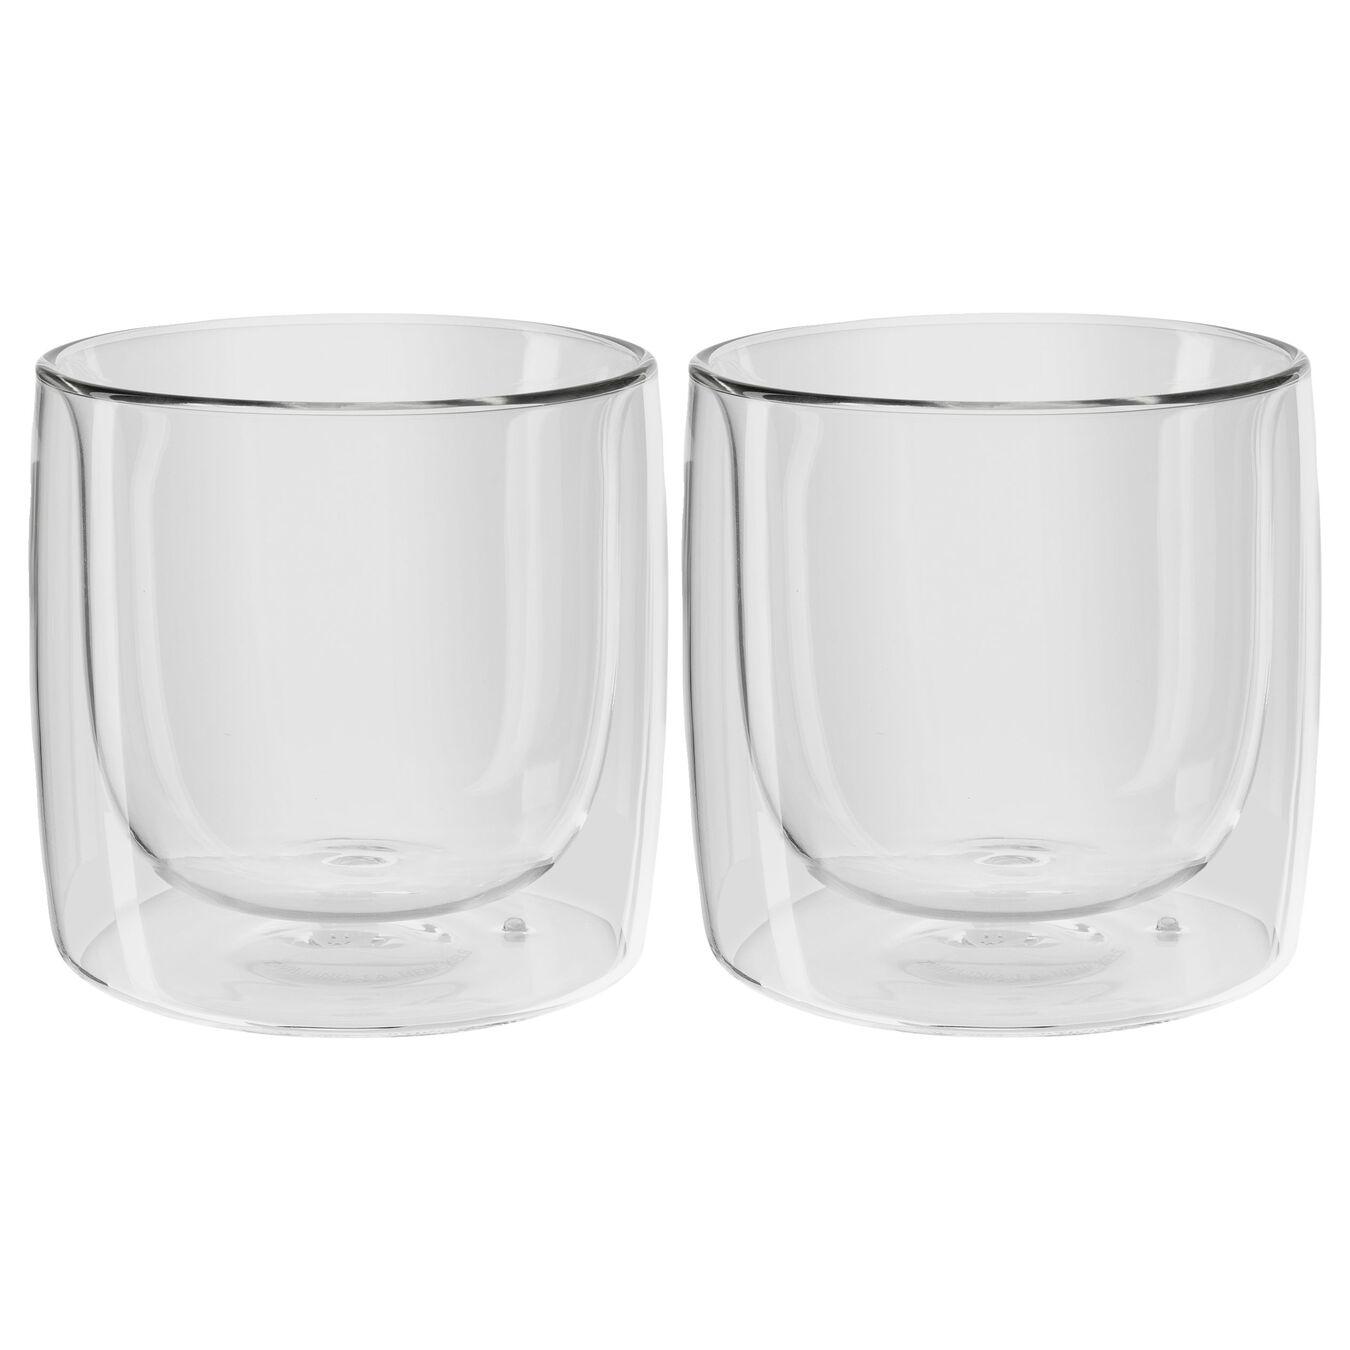 Whiskyglas set 270 ml / 2-st,,large 1